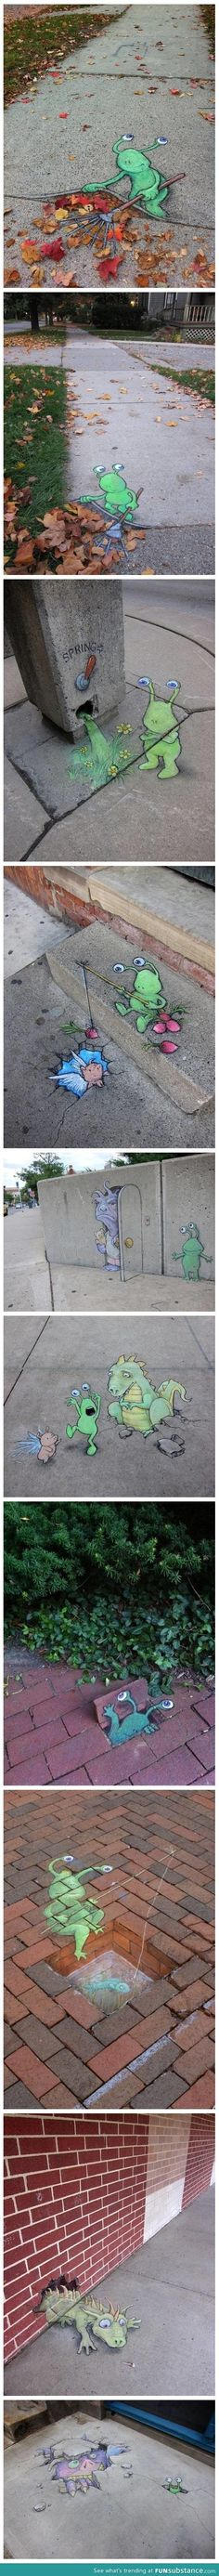 Awesome chalk art by David Zinn